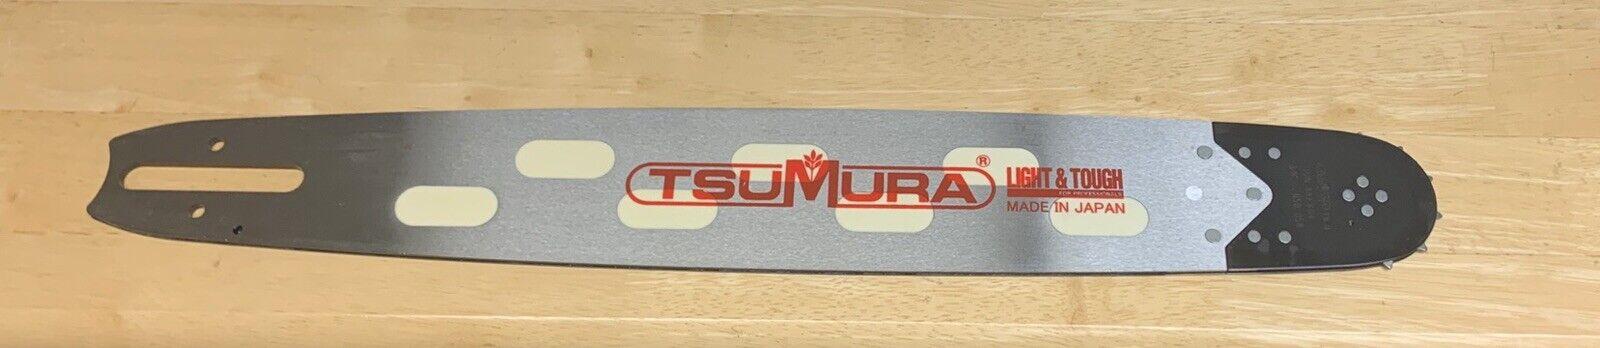 Guía de peso ligero 18  Tsumura Bar 3 8-050-66DL Repl. Stihl 066 MS360 180 rndd 025